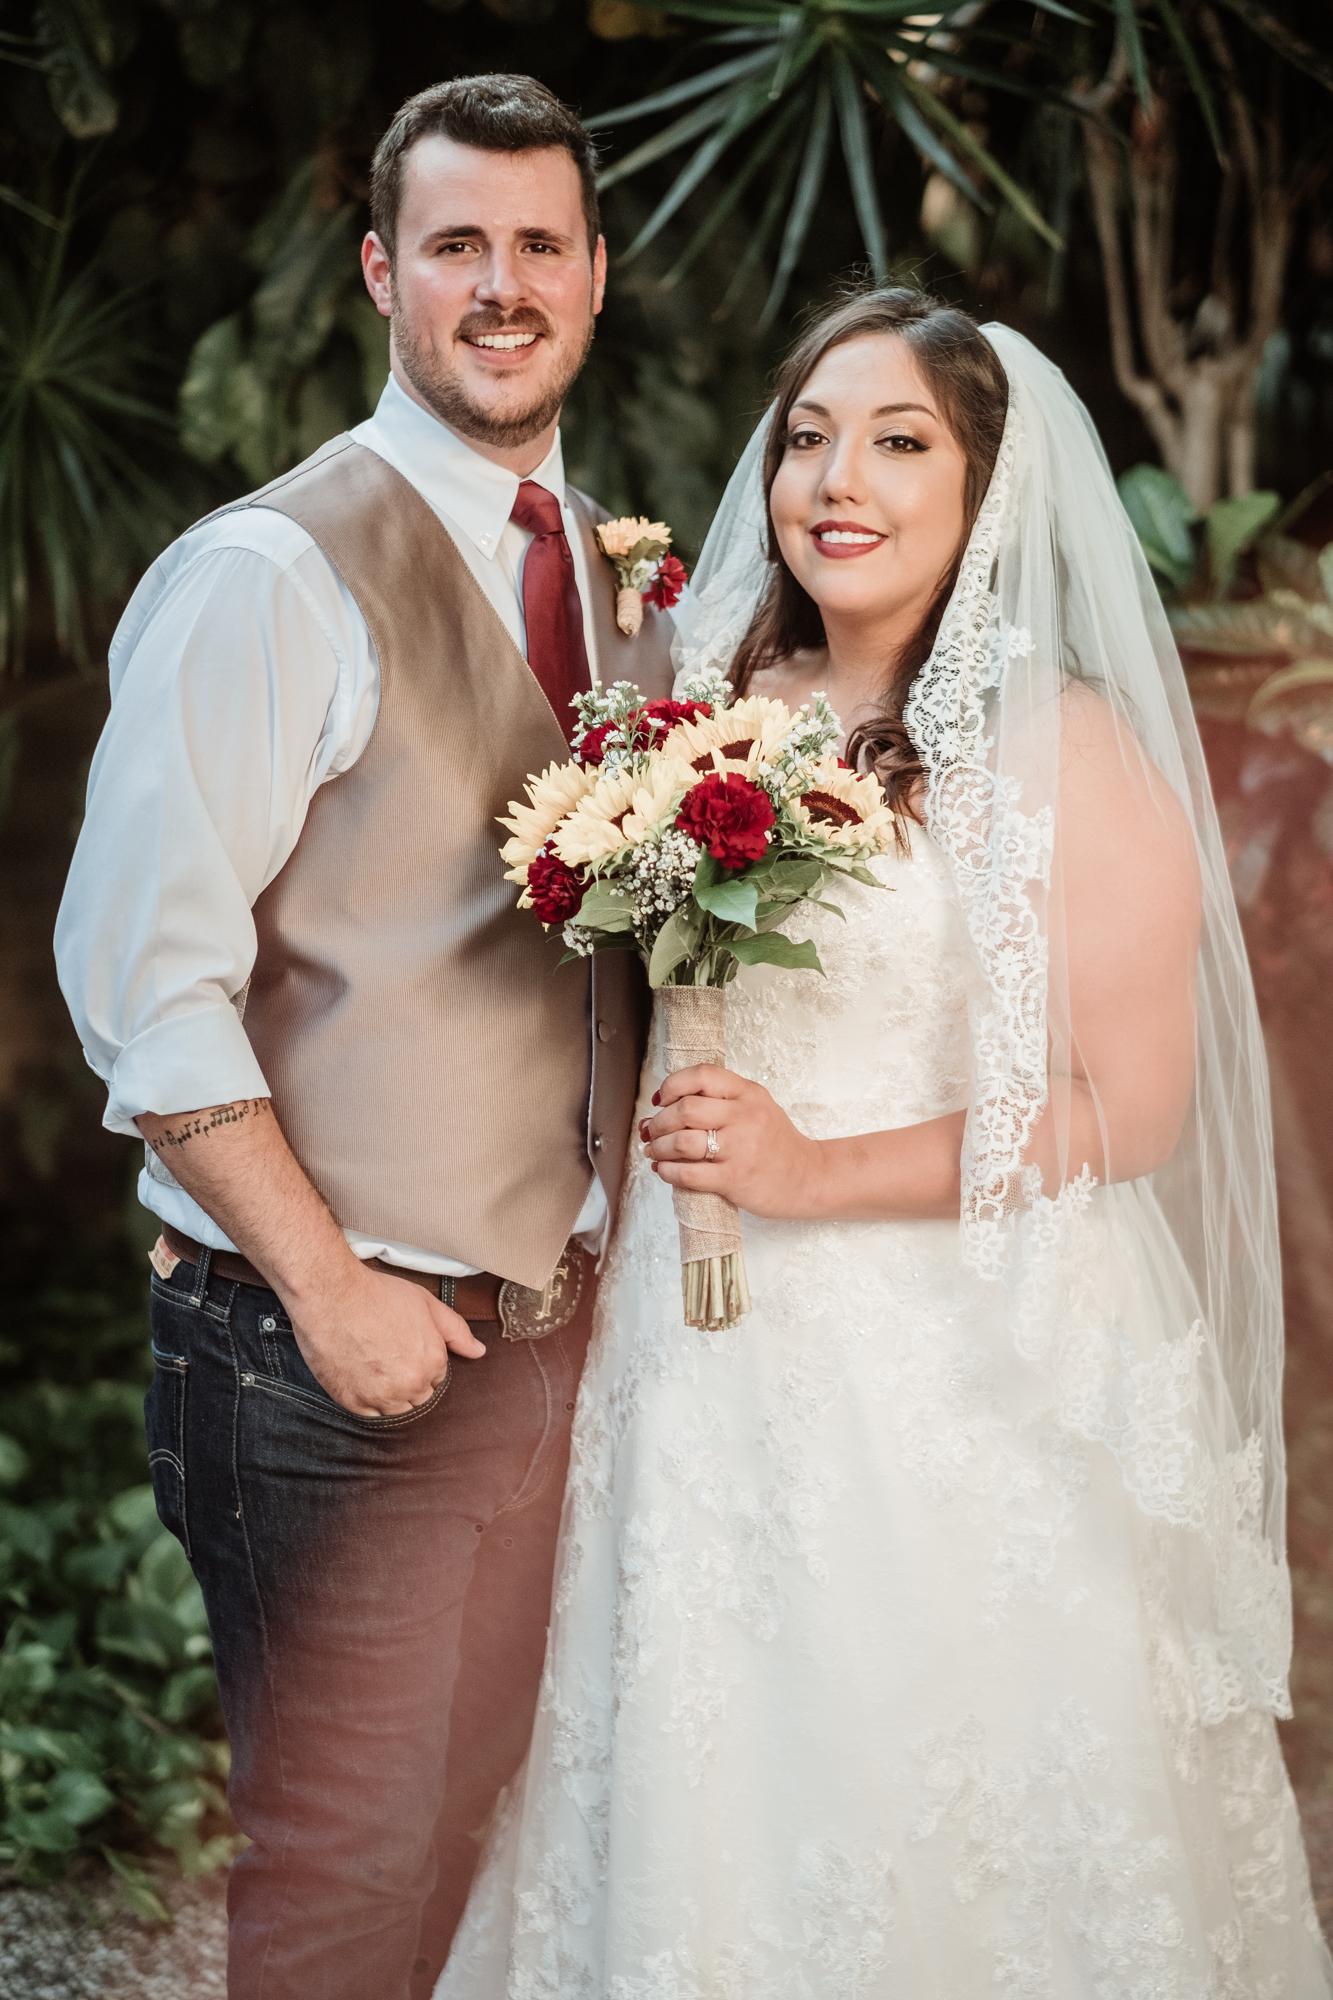 DallasAlyssa-Wedding-2019-JF-1217.jpg